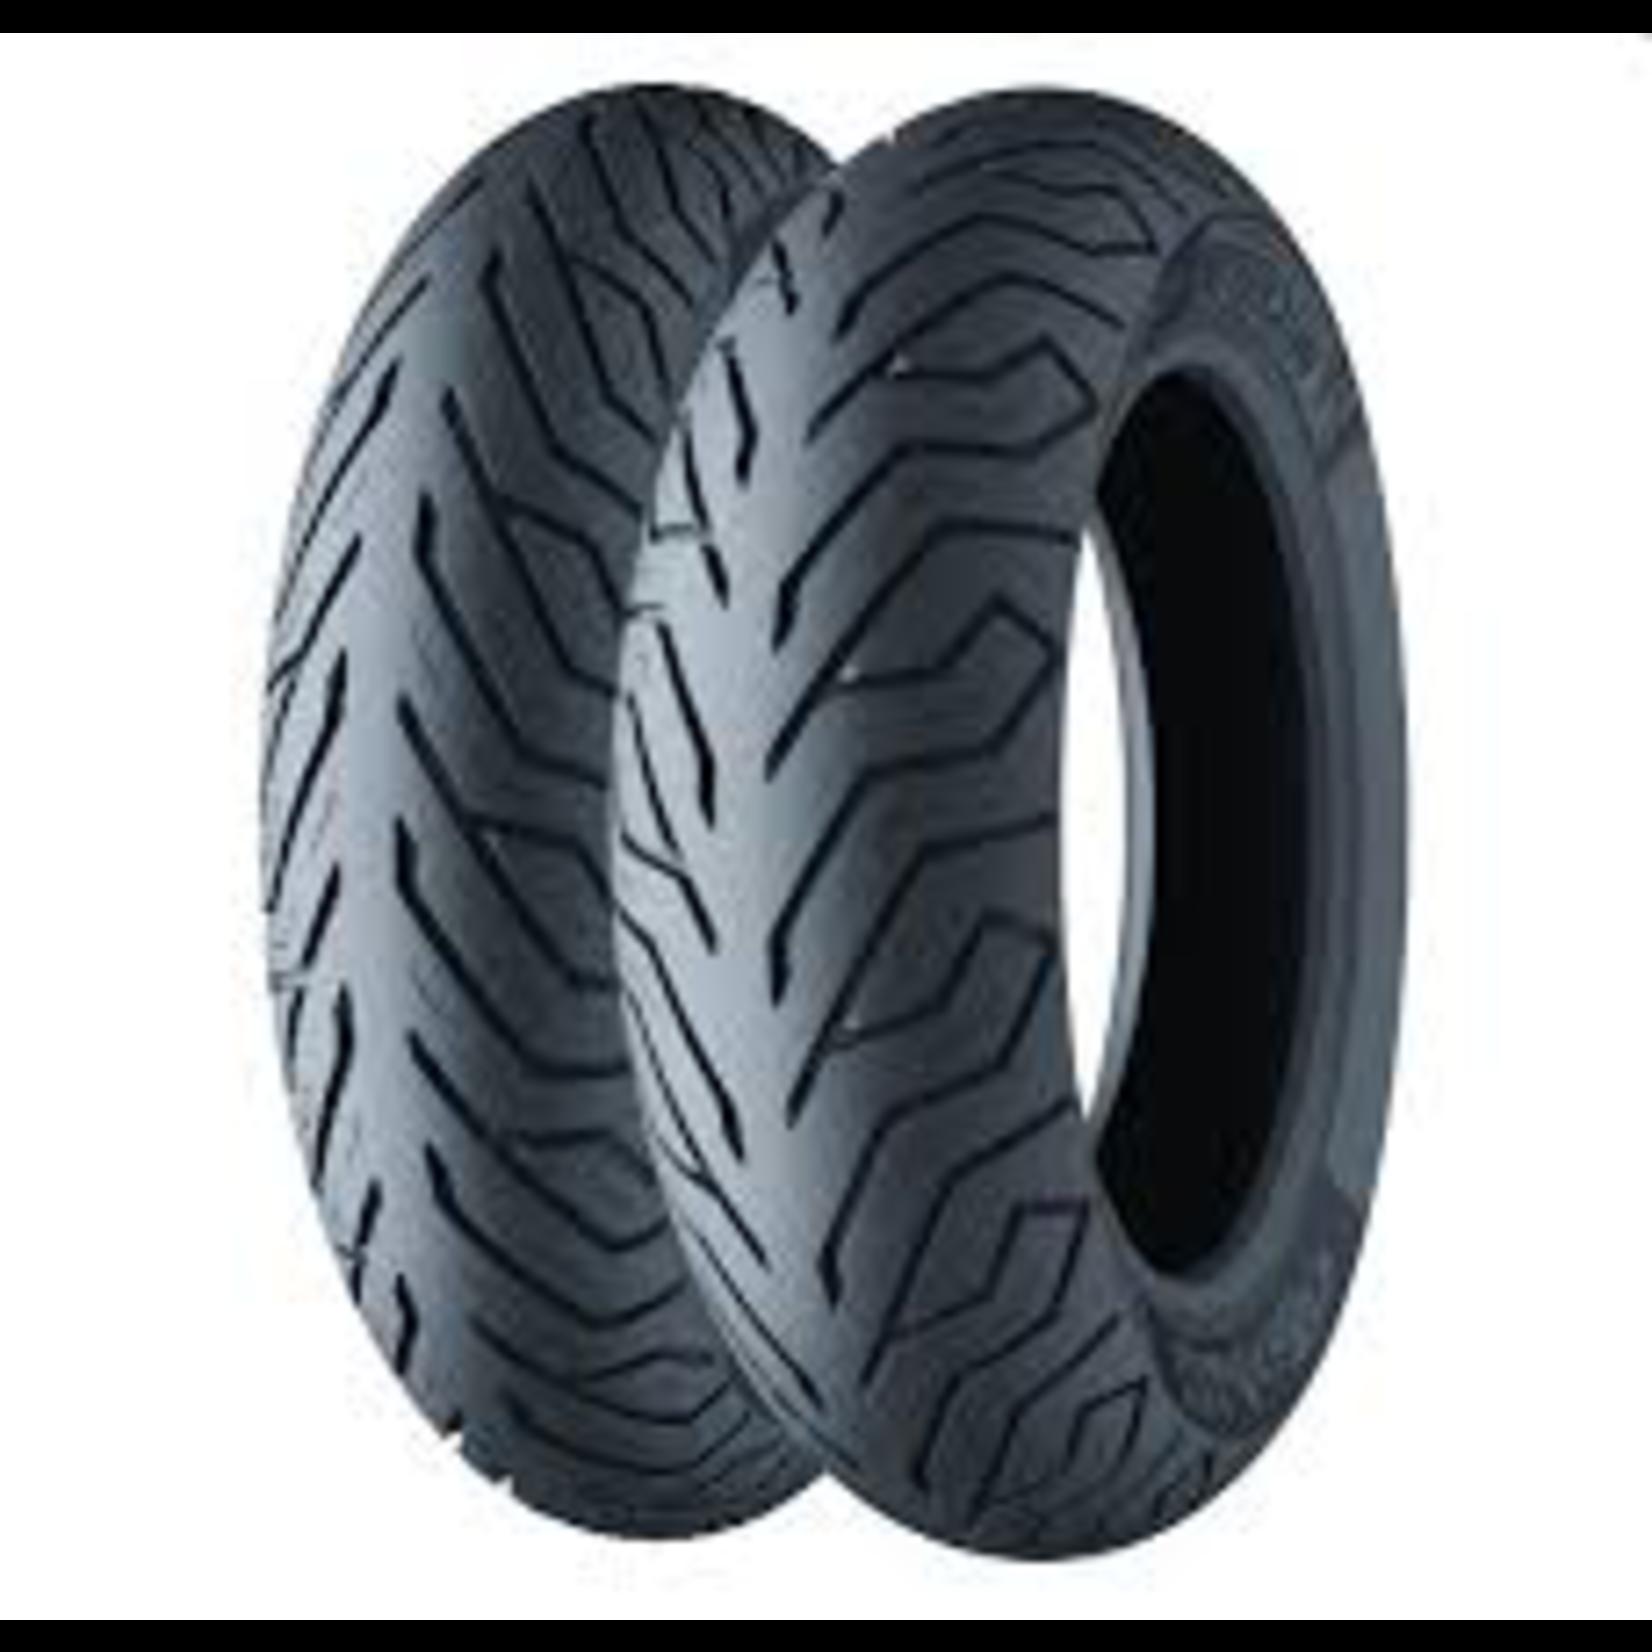 Parts Tire, 130/70-12 Michelin City Grip Reinforced (Rear)